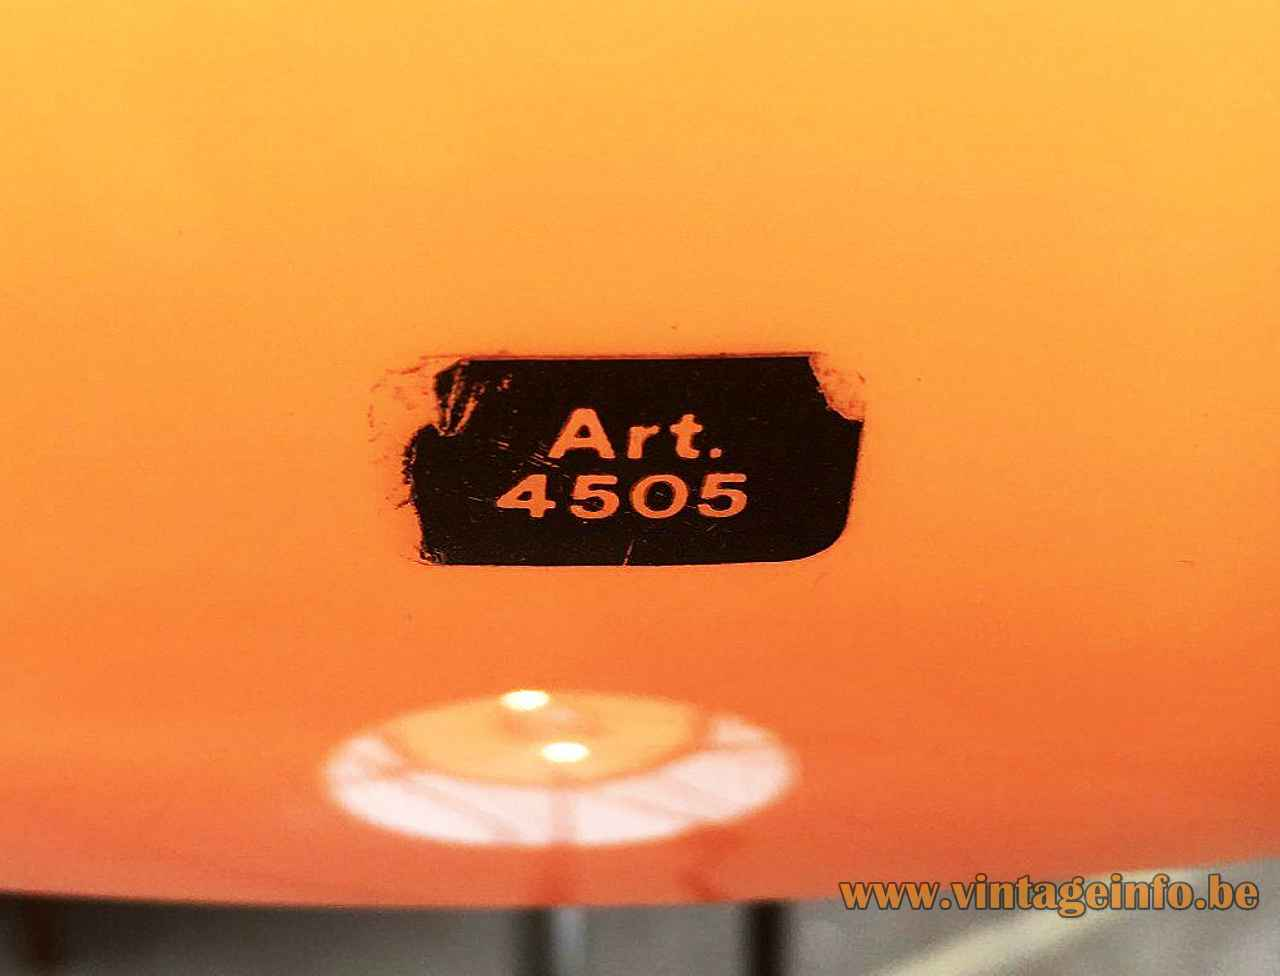 Harveiluce Lucerna floor lamp 1966 design: Harvey Guzzini 4505 black plastic label Italy 1960s 1970s